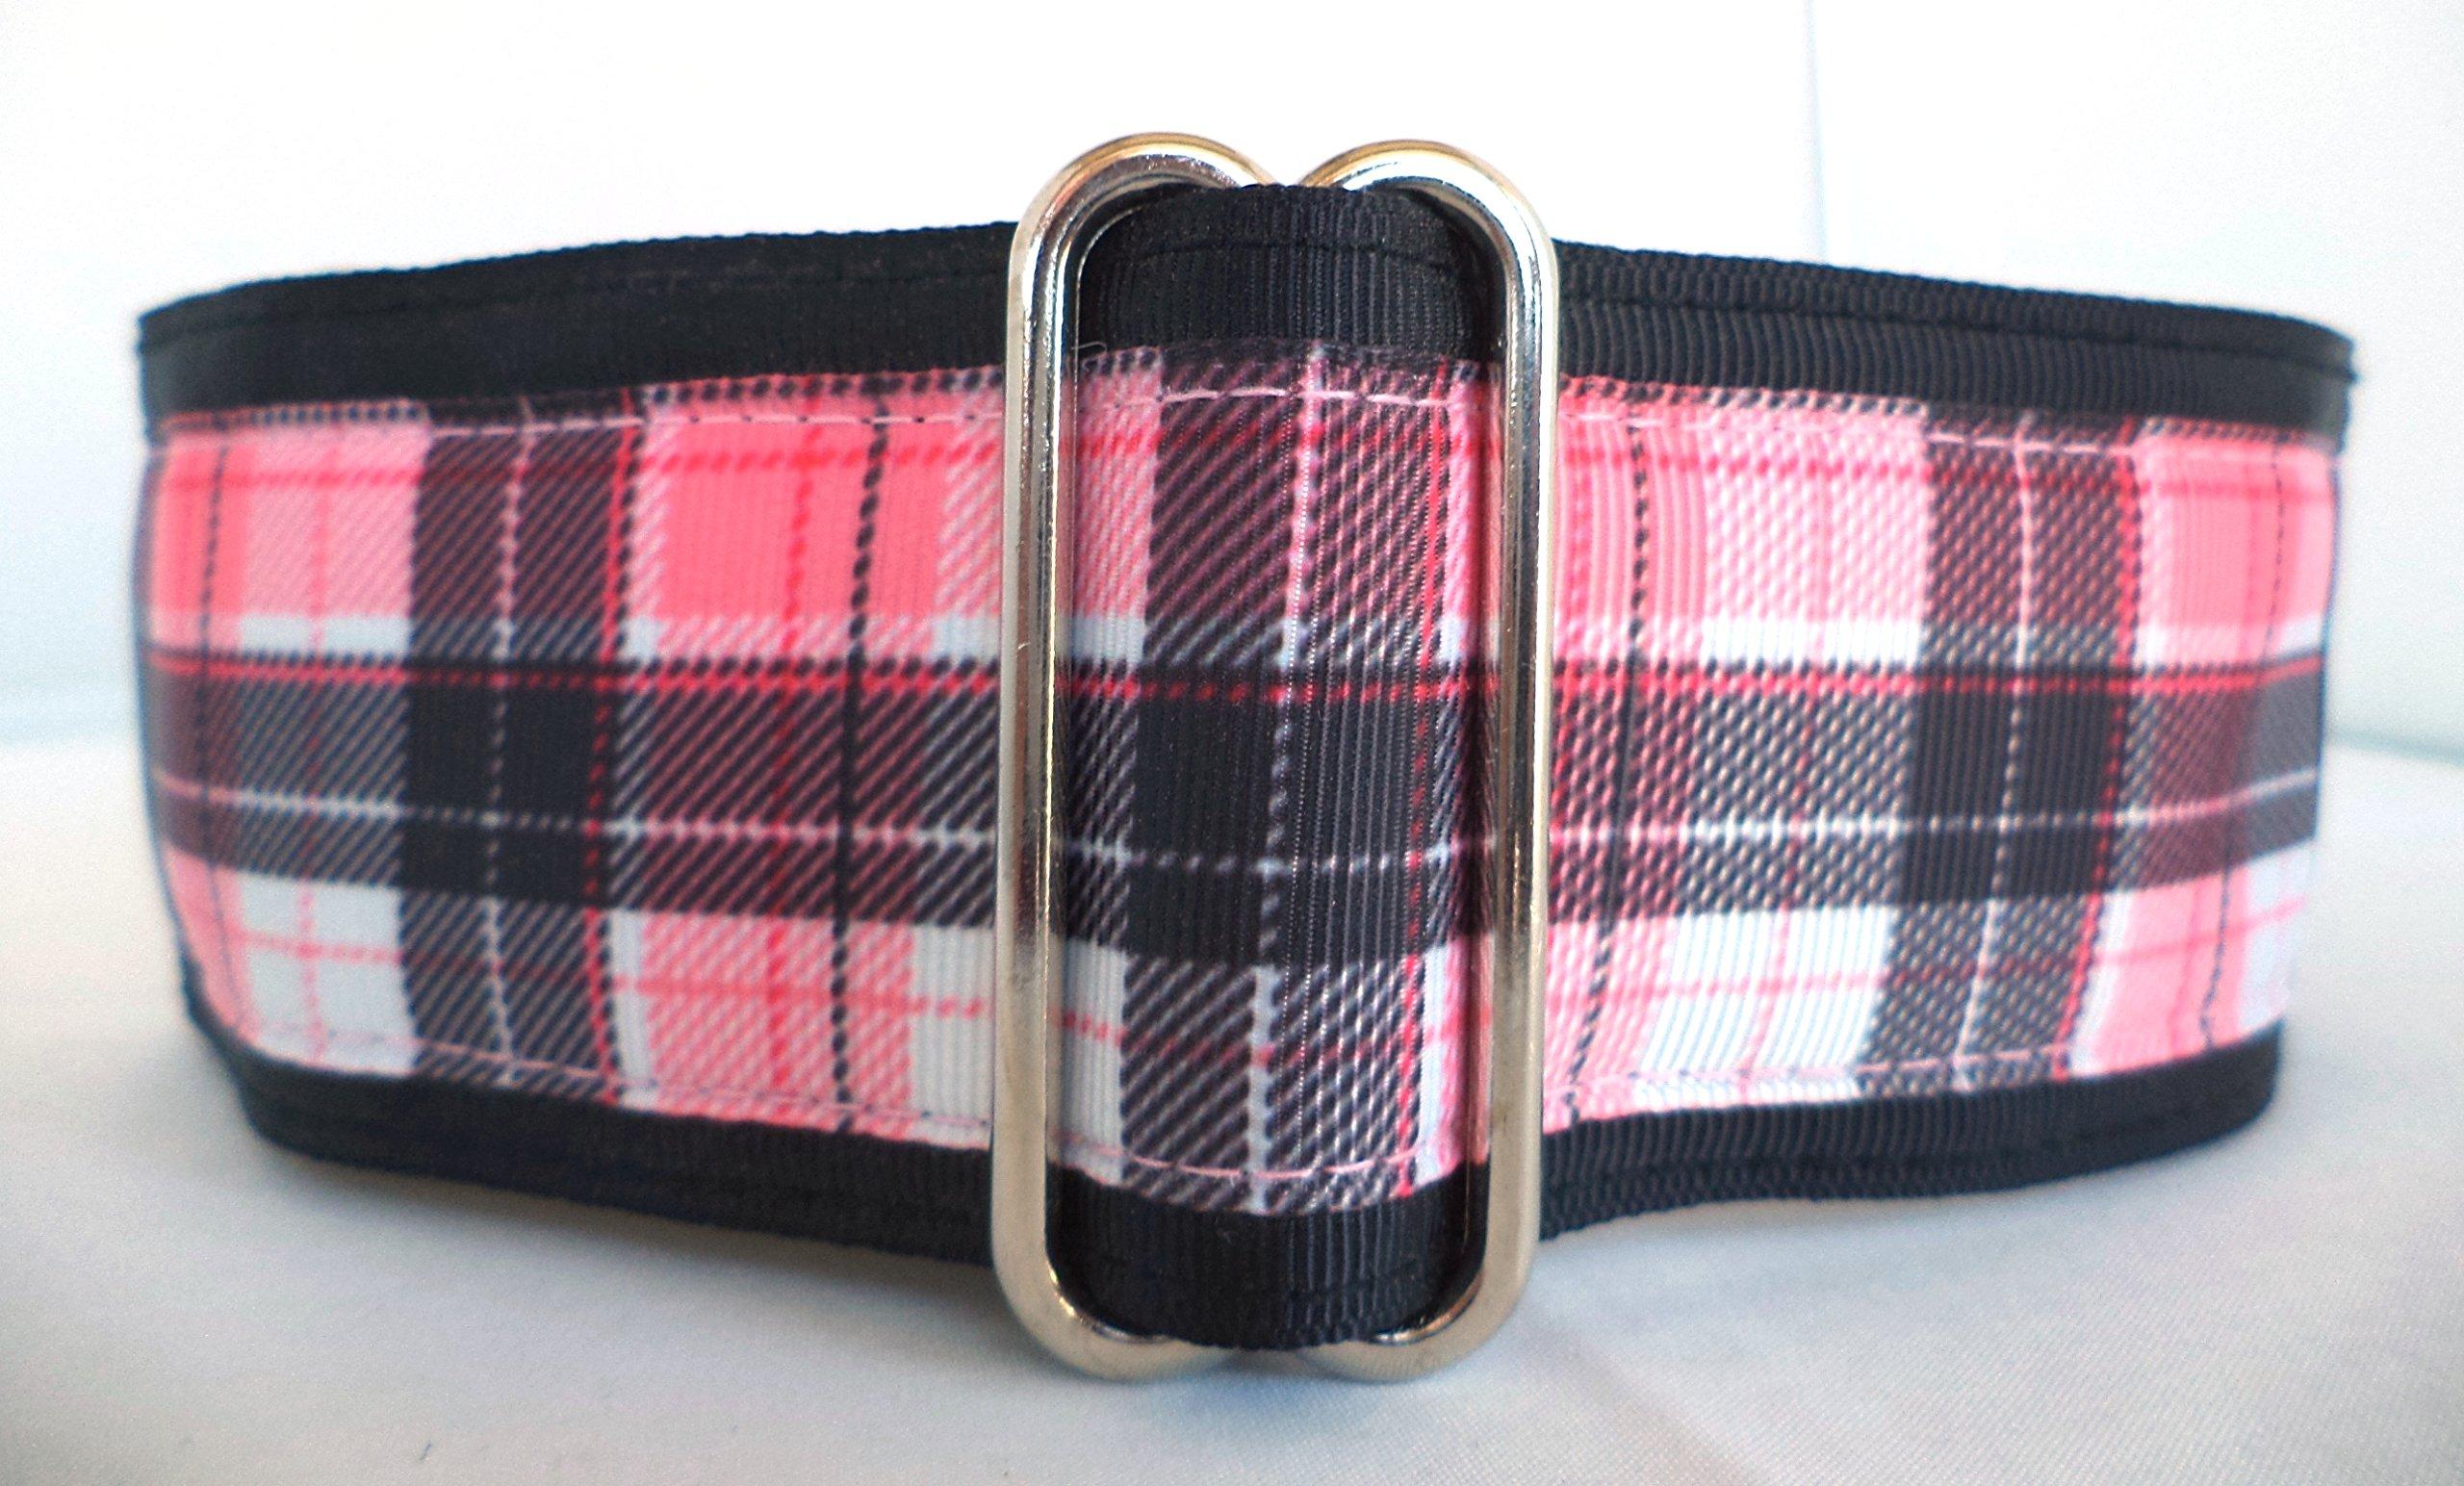 Regal Hound Designs 2'' Wide Martingale Dog Collar, Lined, 2 Sizes: Medium, Large/XL, Pink and Black Plaid Design (Medium 13-18'')